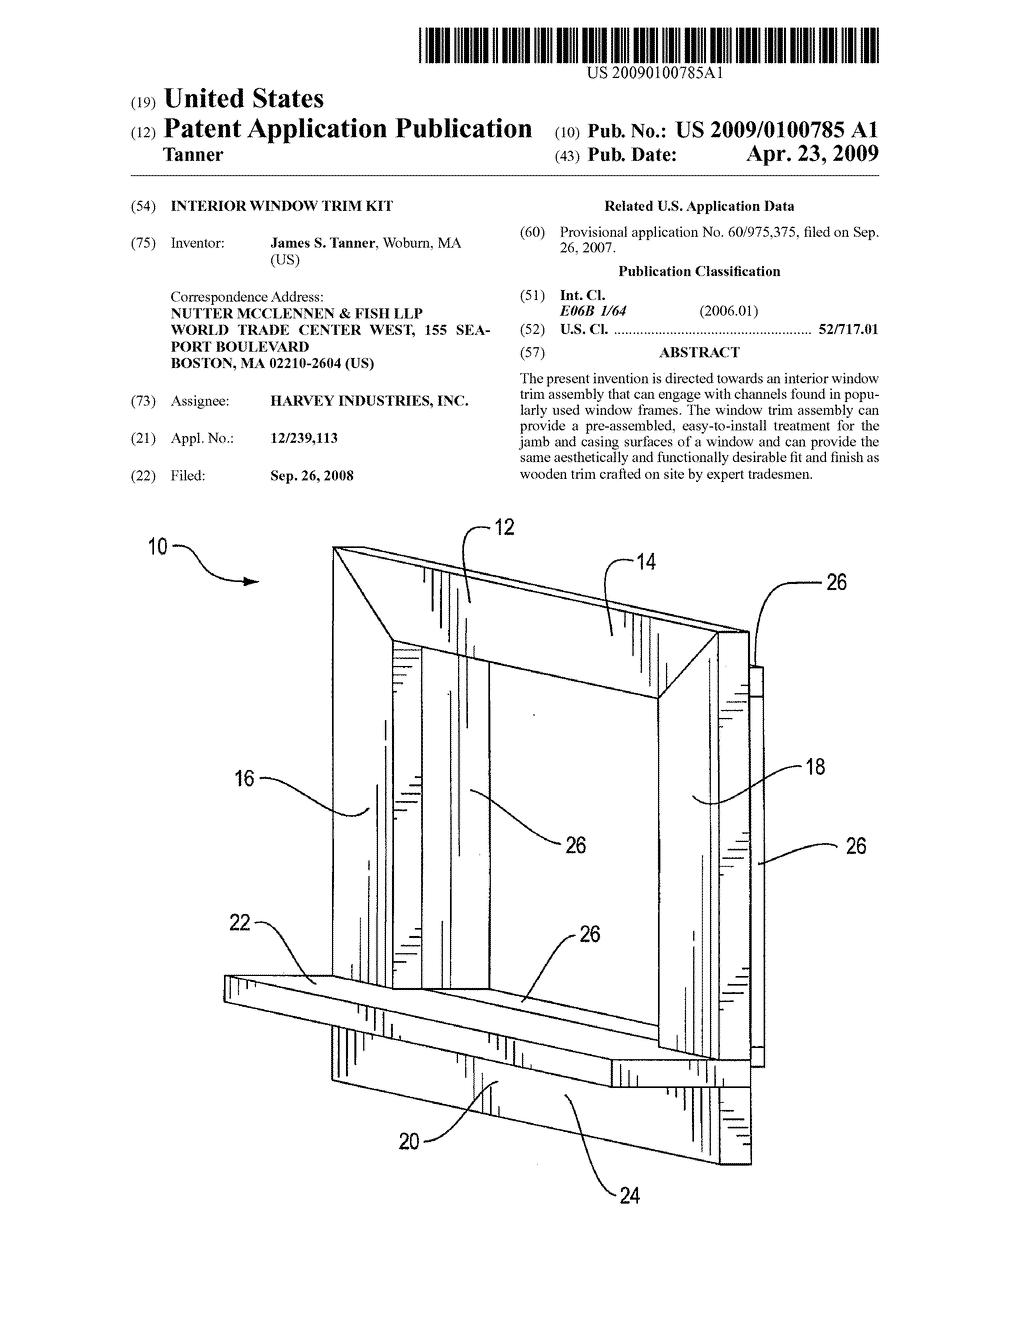 Interior window trim kit - Interior Window Trim Kit 0